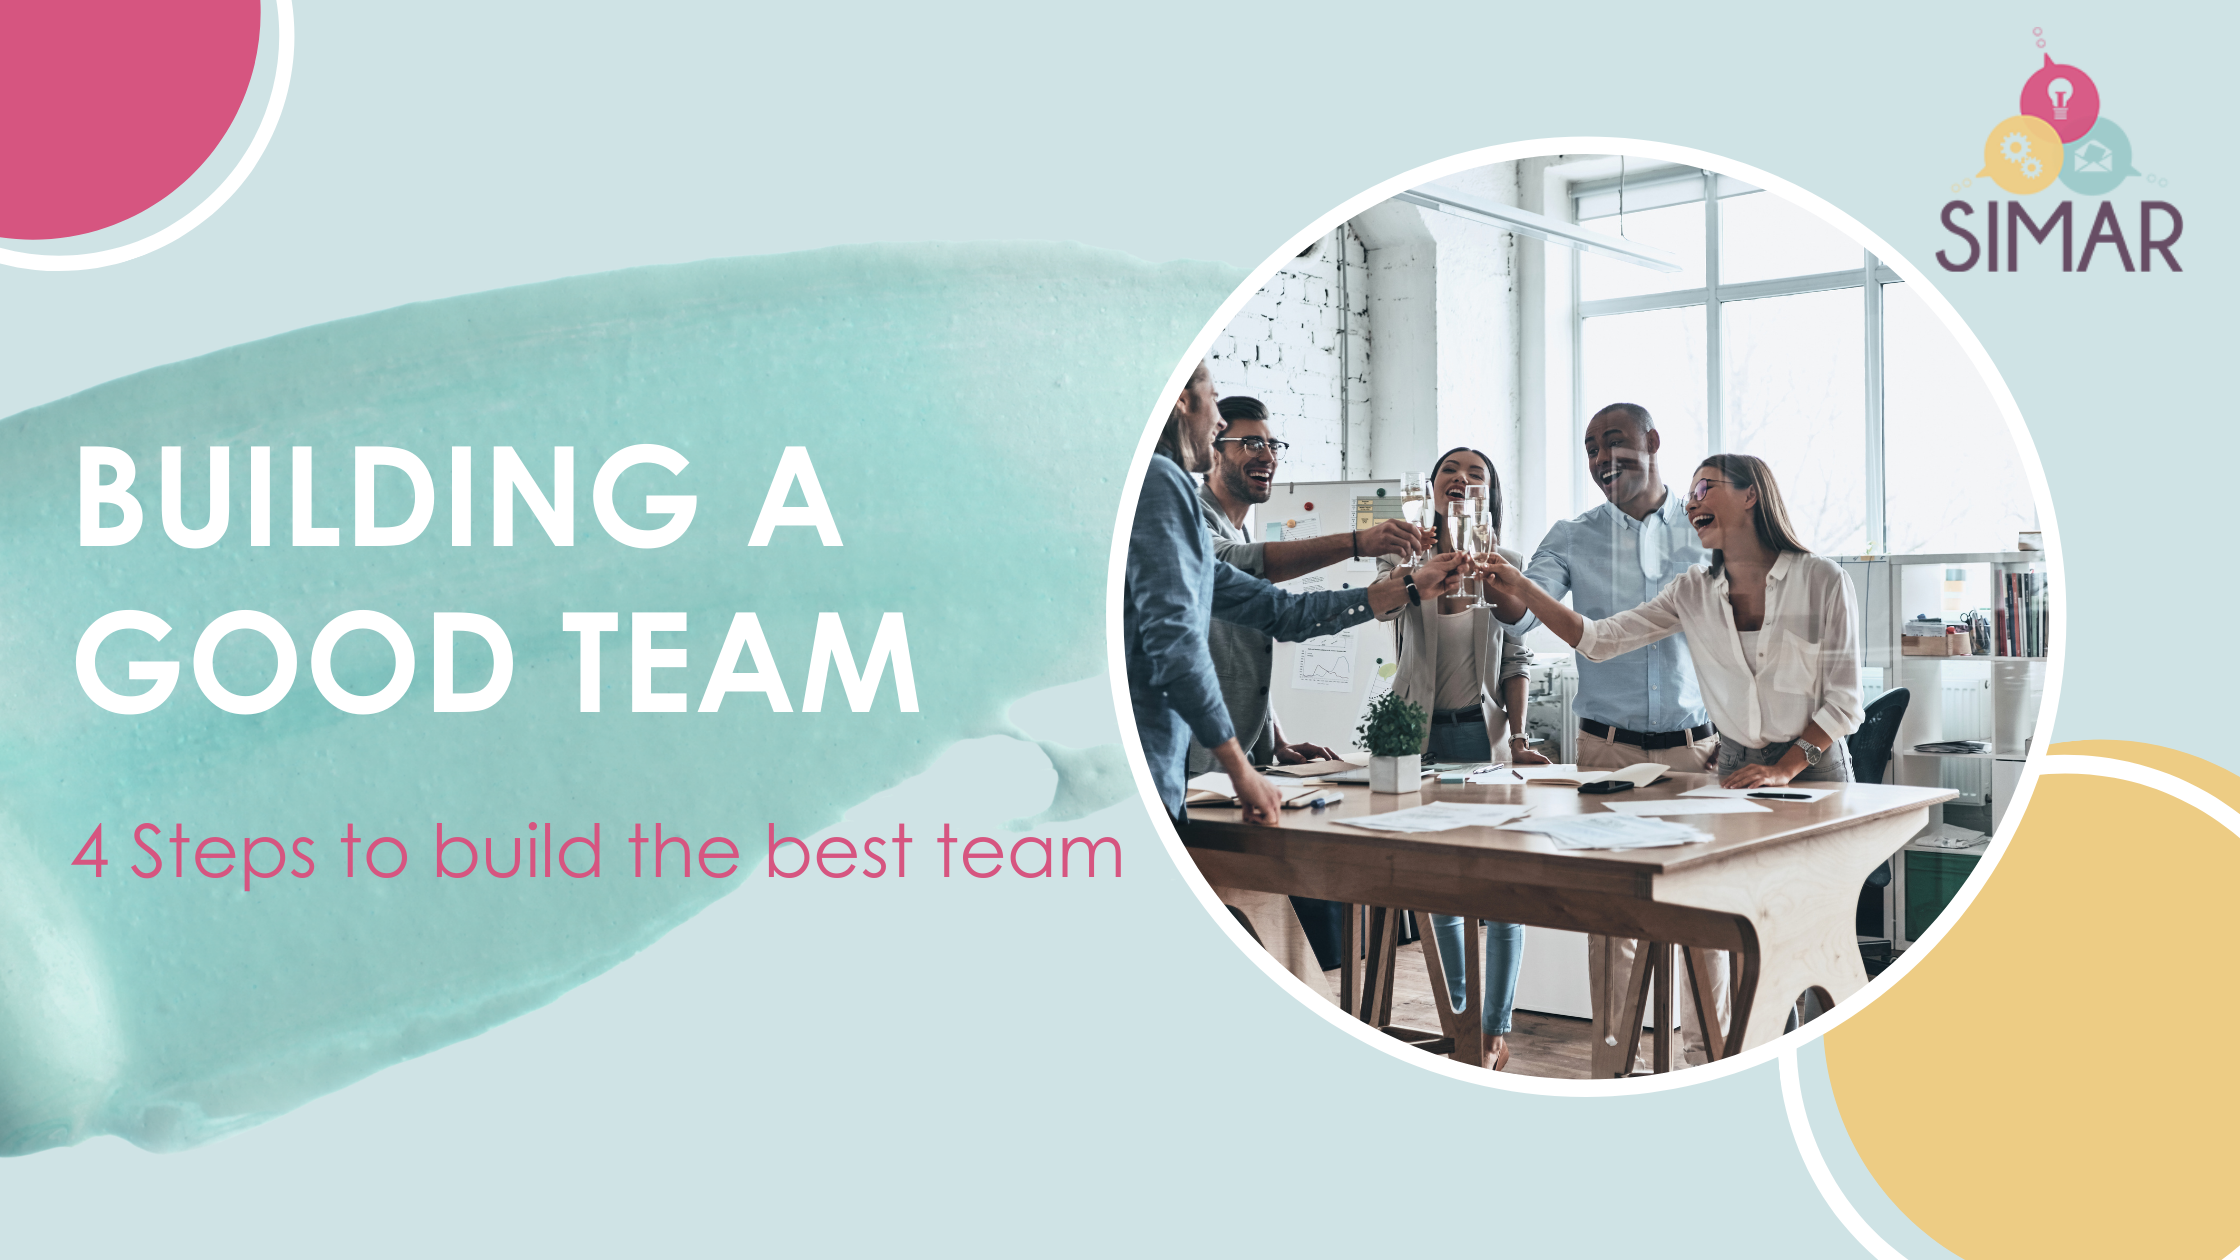 Building a Good Team